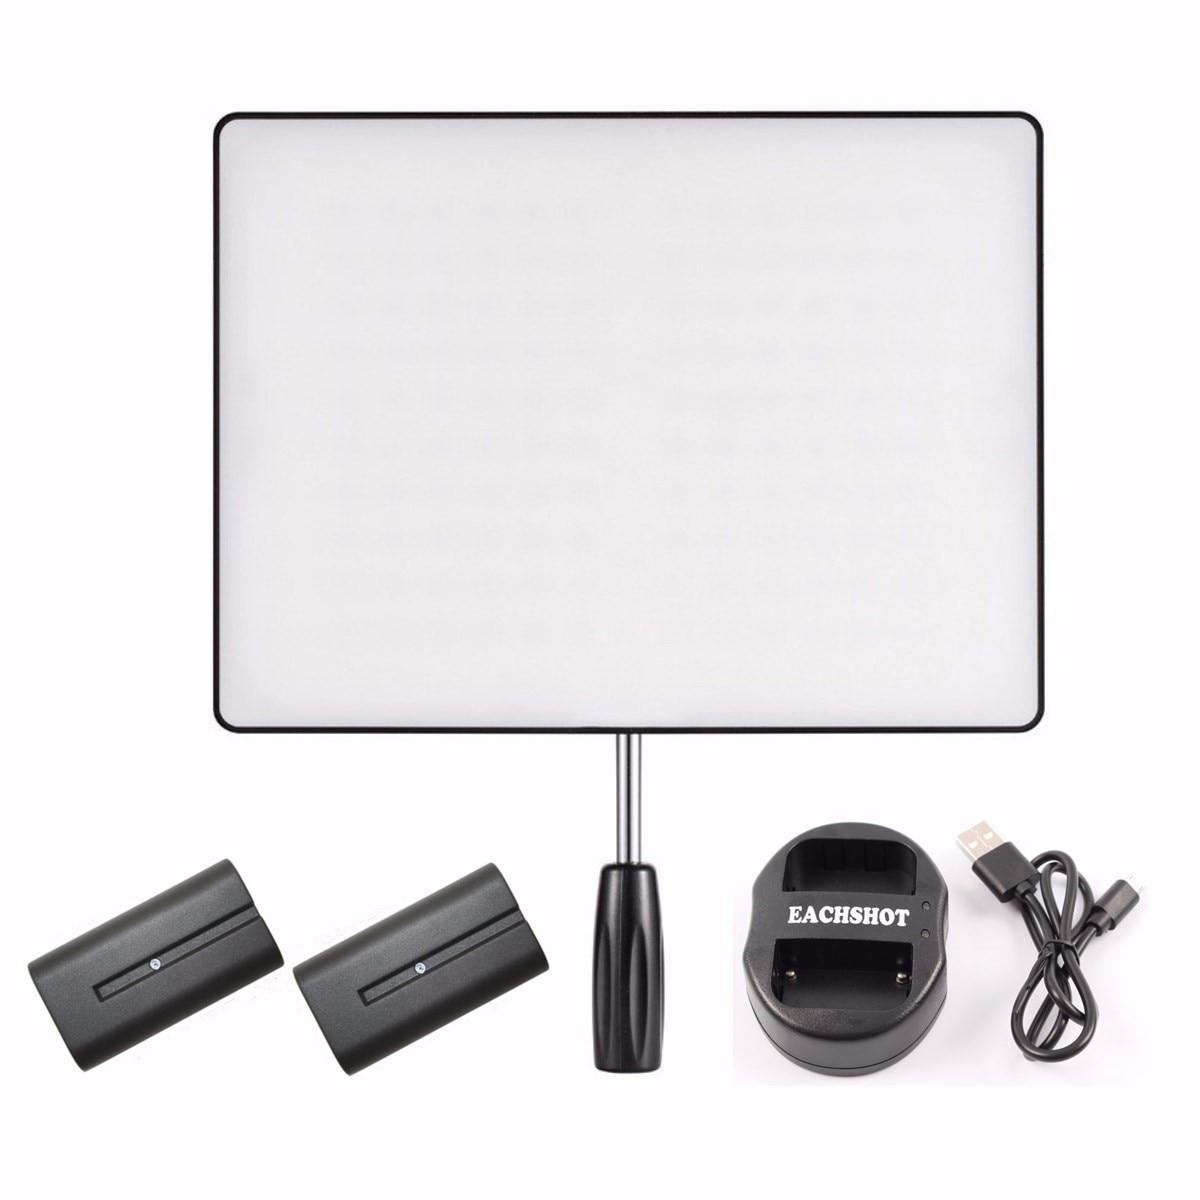 YONGNUO YN600 Воздуха Камеры LED Video Light Для DSLR + 2 * NP-F550 Аккумулятор + Двойной Зарядное Устройство